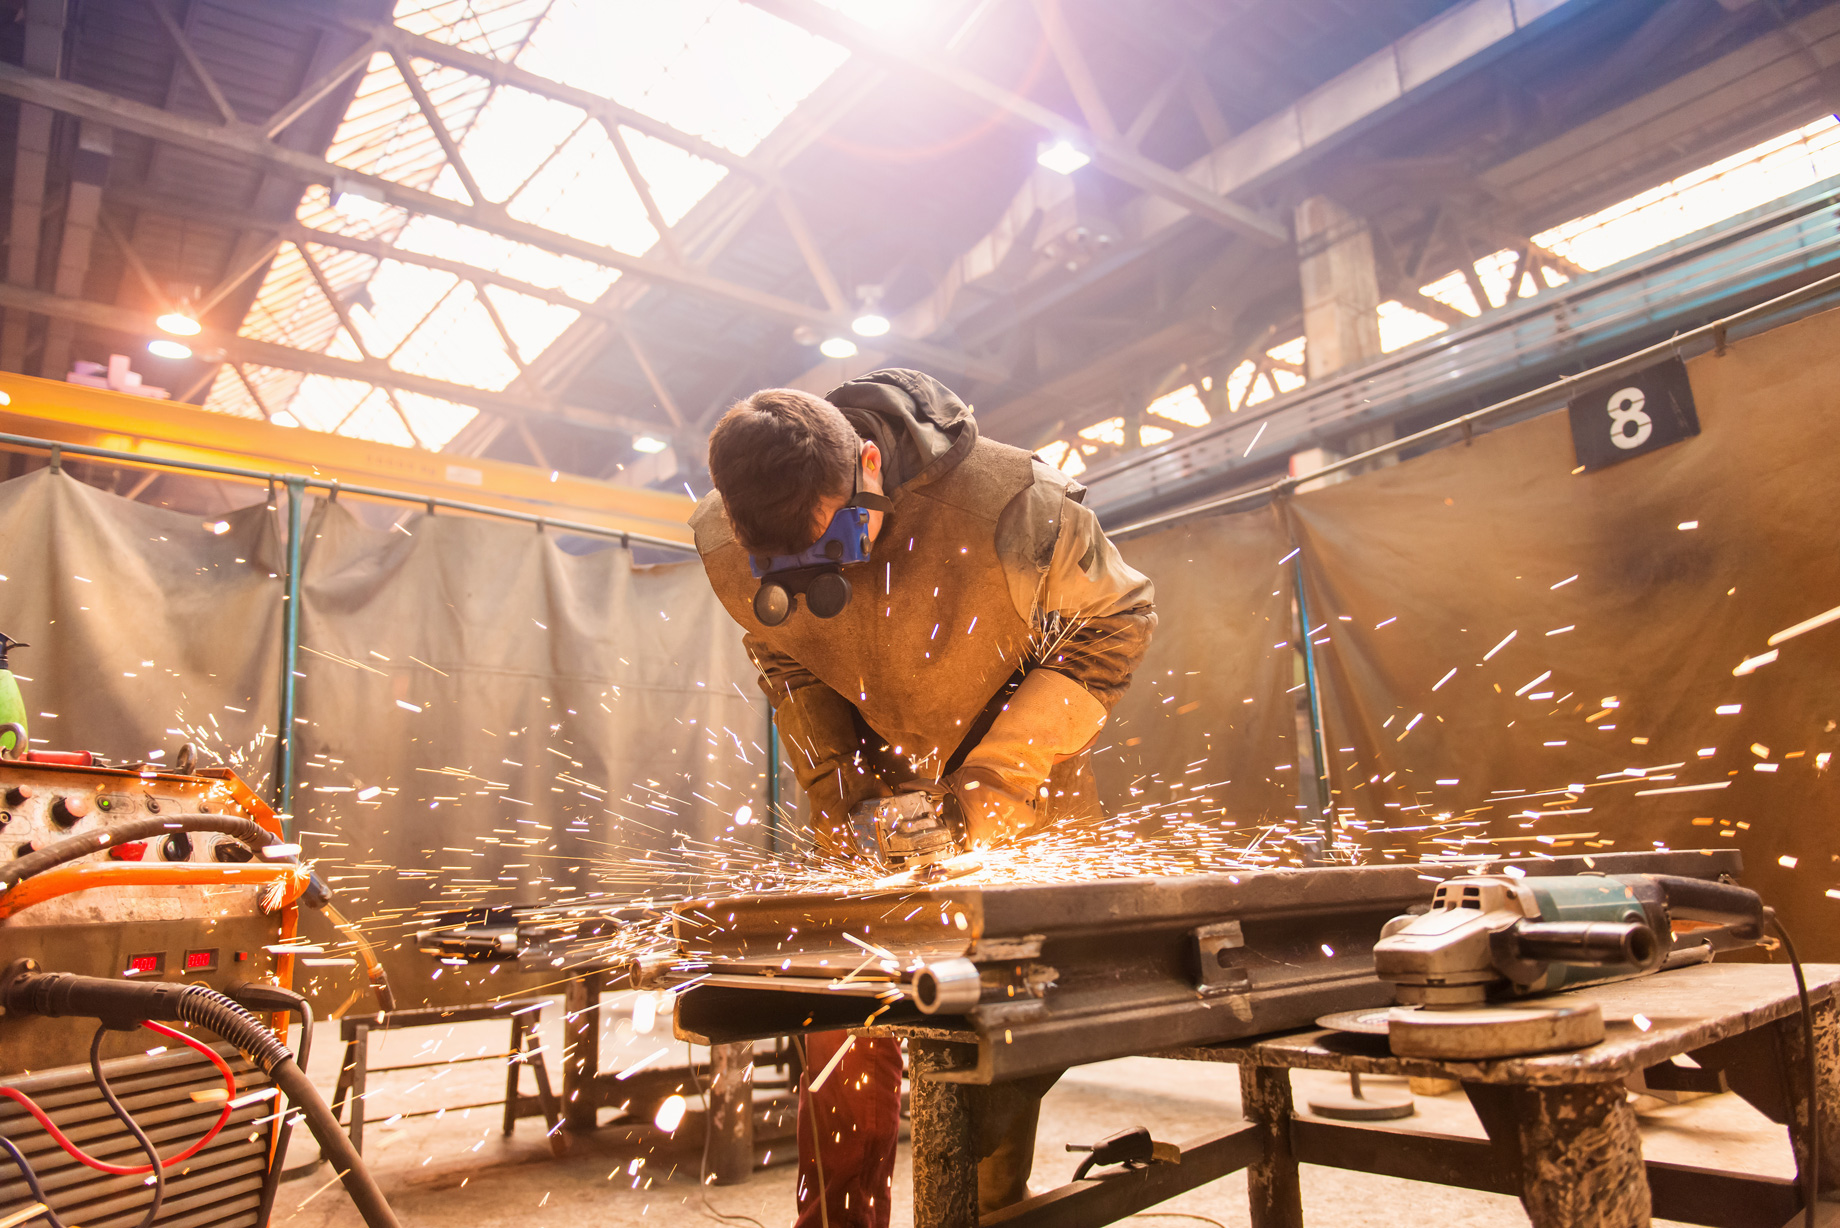 In the Robotic Welding Industry? Read This.